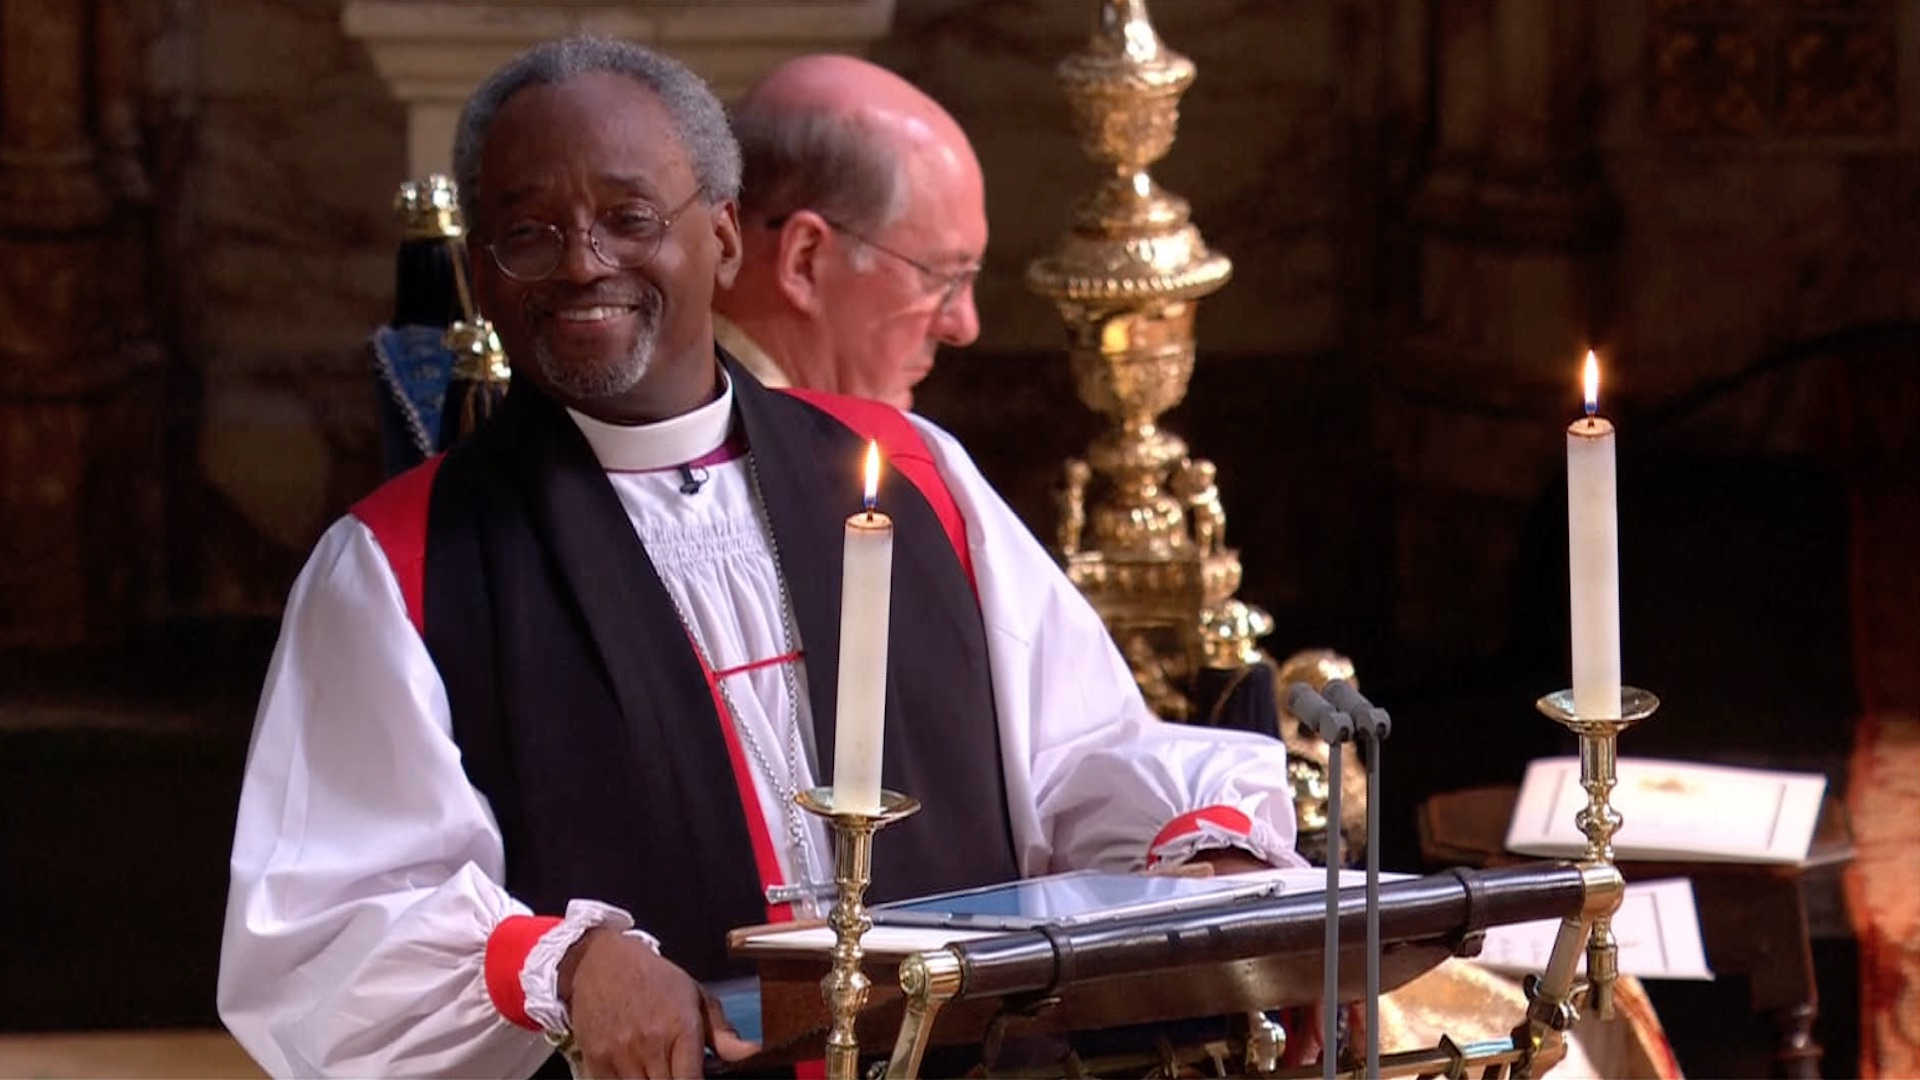 Read Episcopal Church S Michael Curry S Address At Royal Wedding